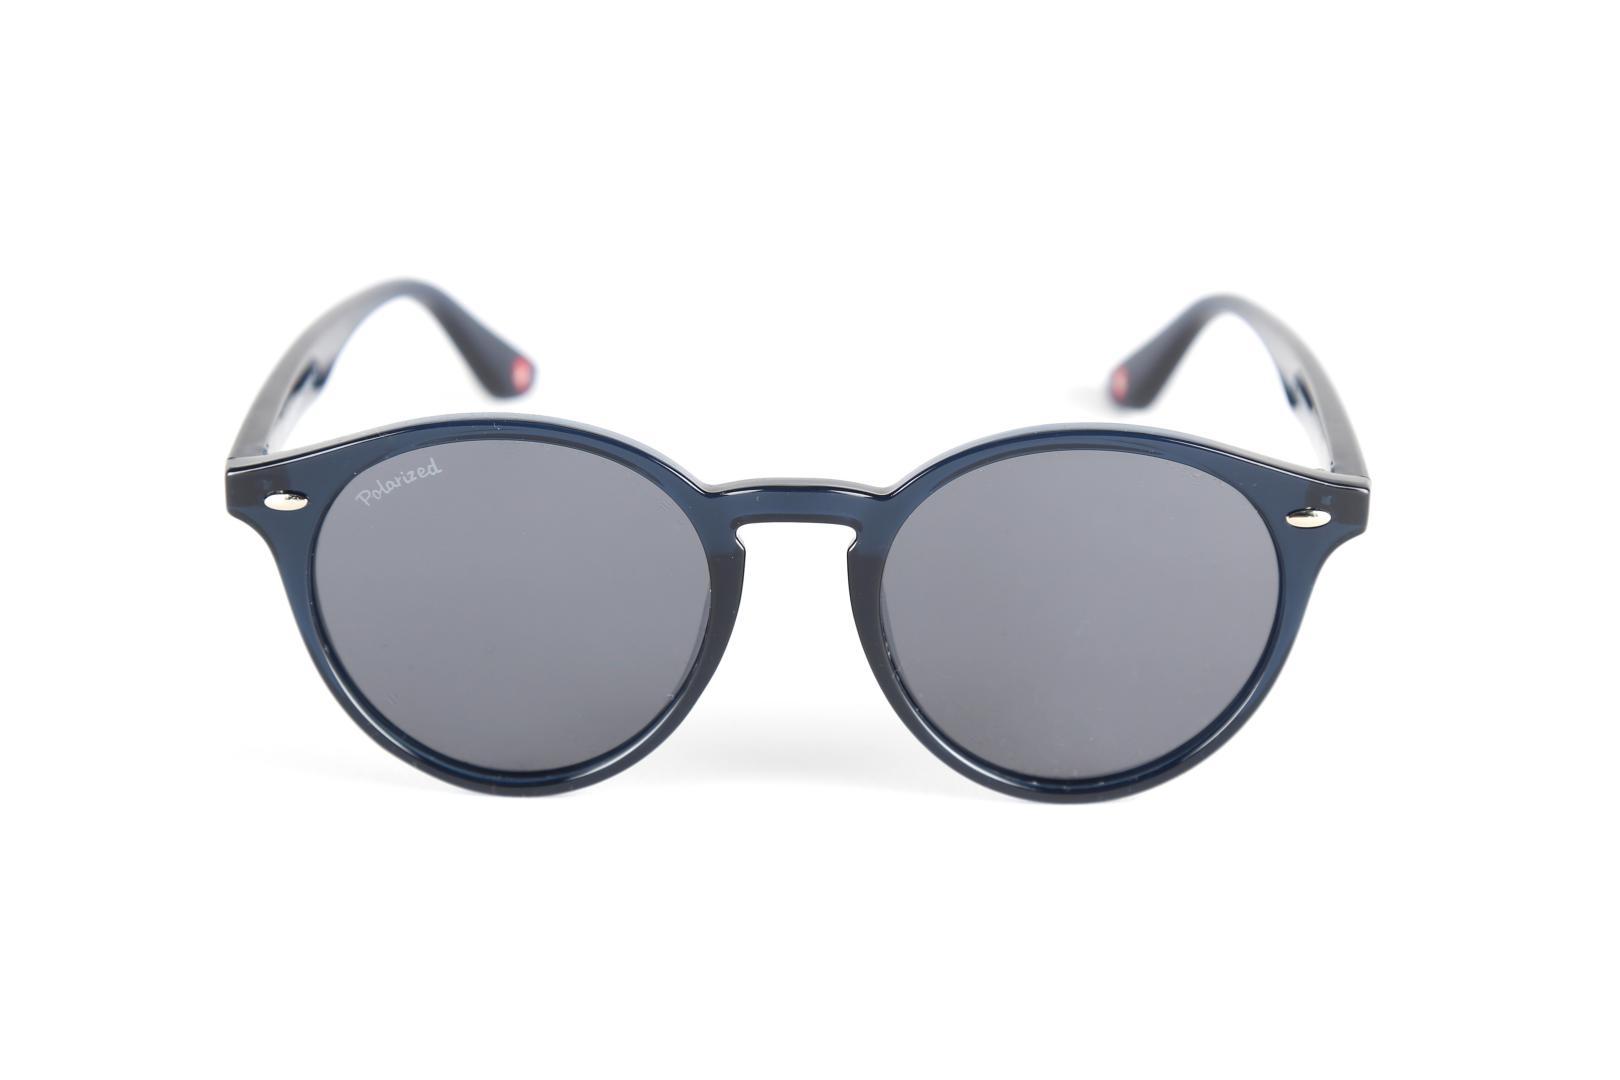 Montana Eyewear MP20-Blau-Schwarz h6vcfU0Uoc